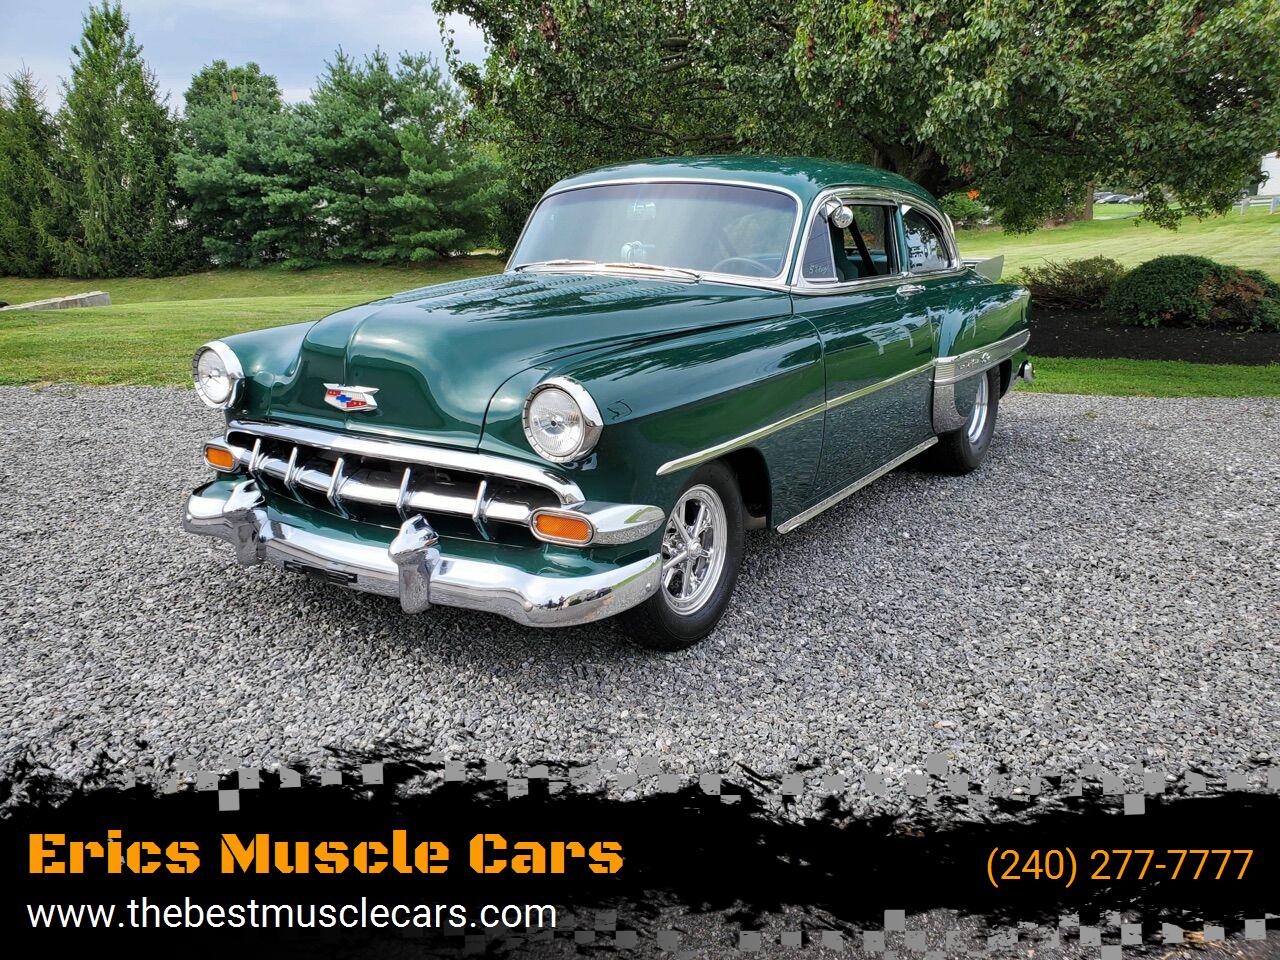 1954 Chevrolet PRO STREET Bel Air